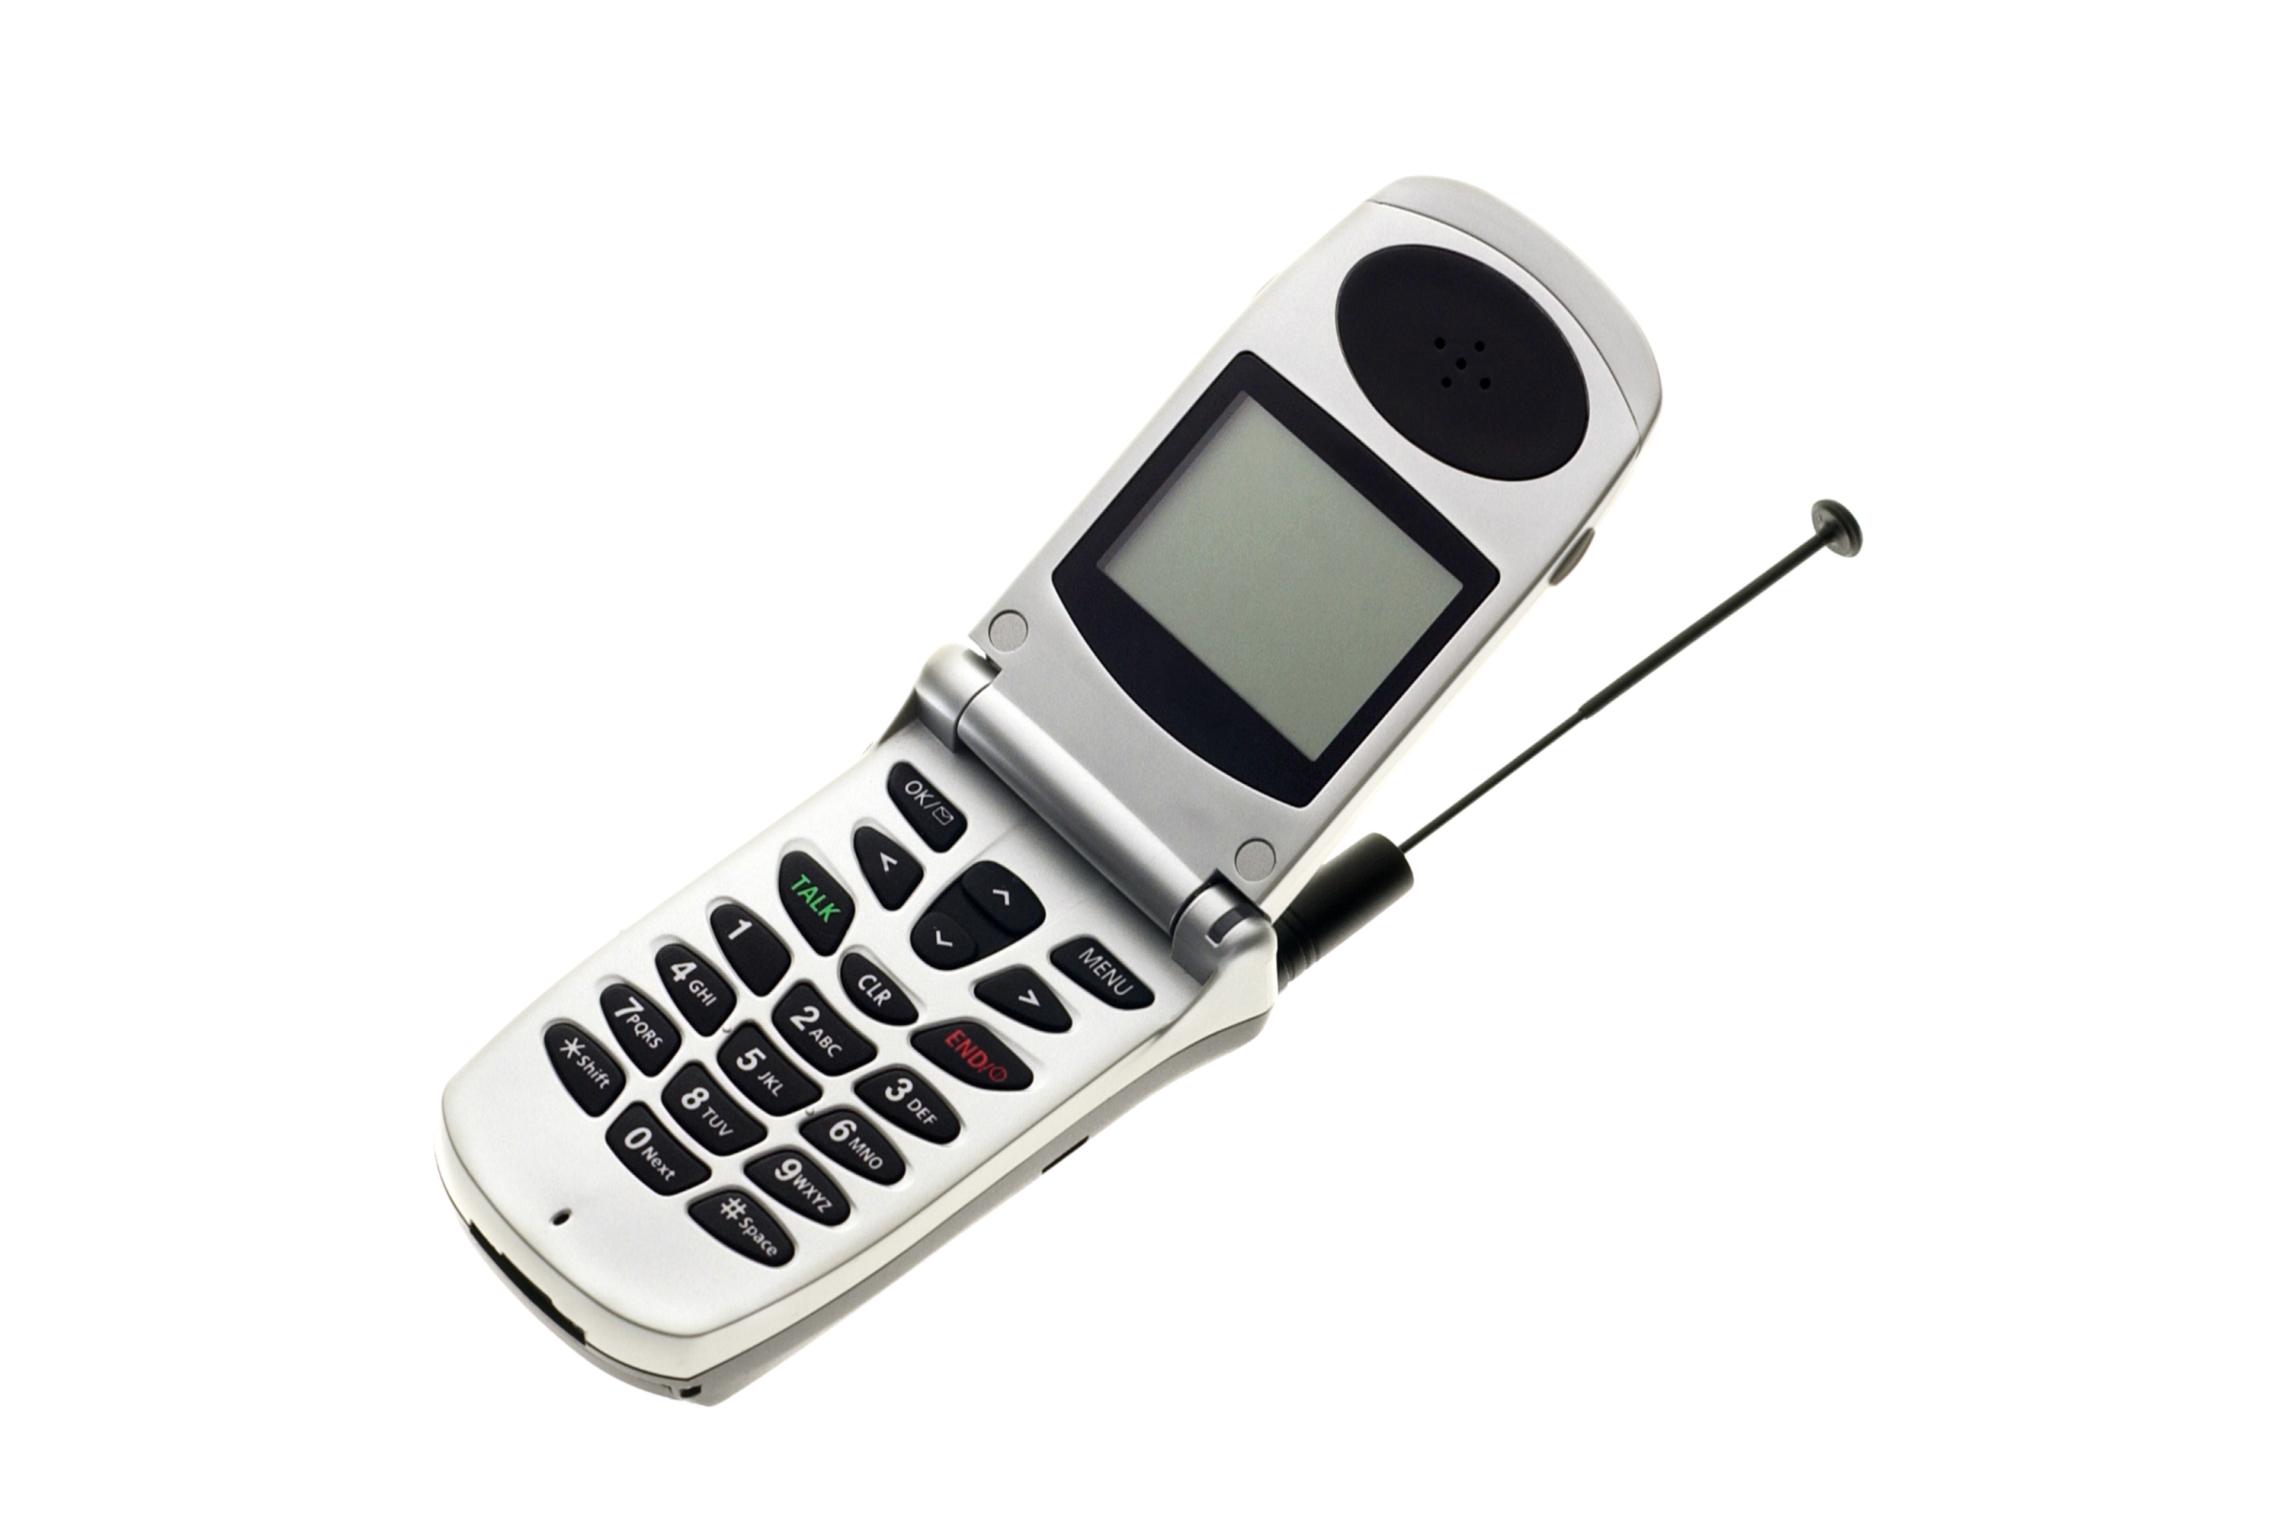 Rastrear celular por gps nextel - Como hackear whatsapp de otra persona desde android